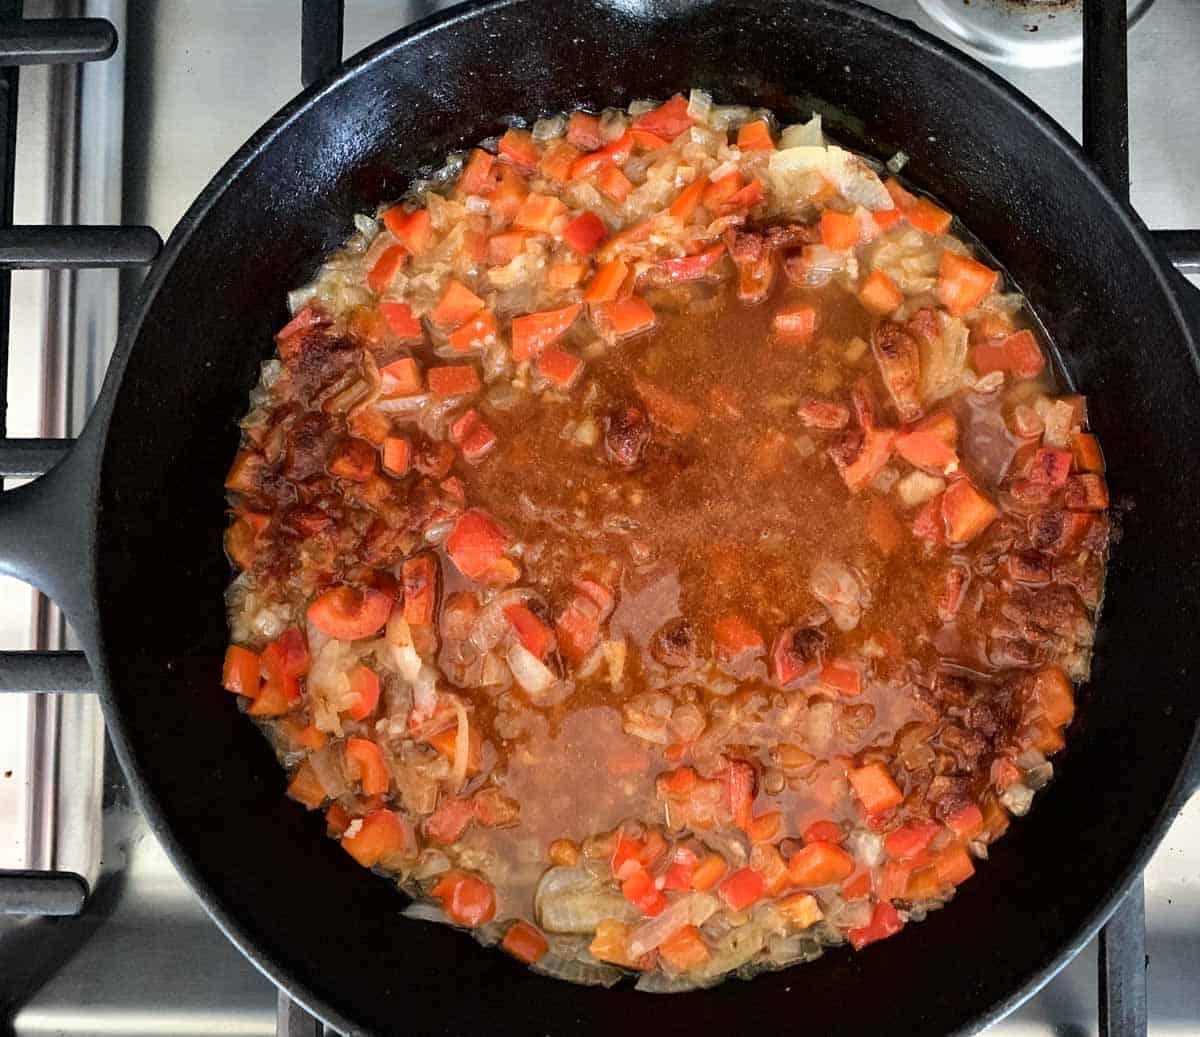 step 2: add chicken broth, paprika and salt